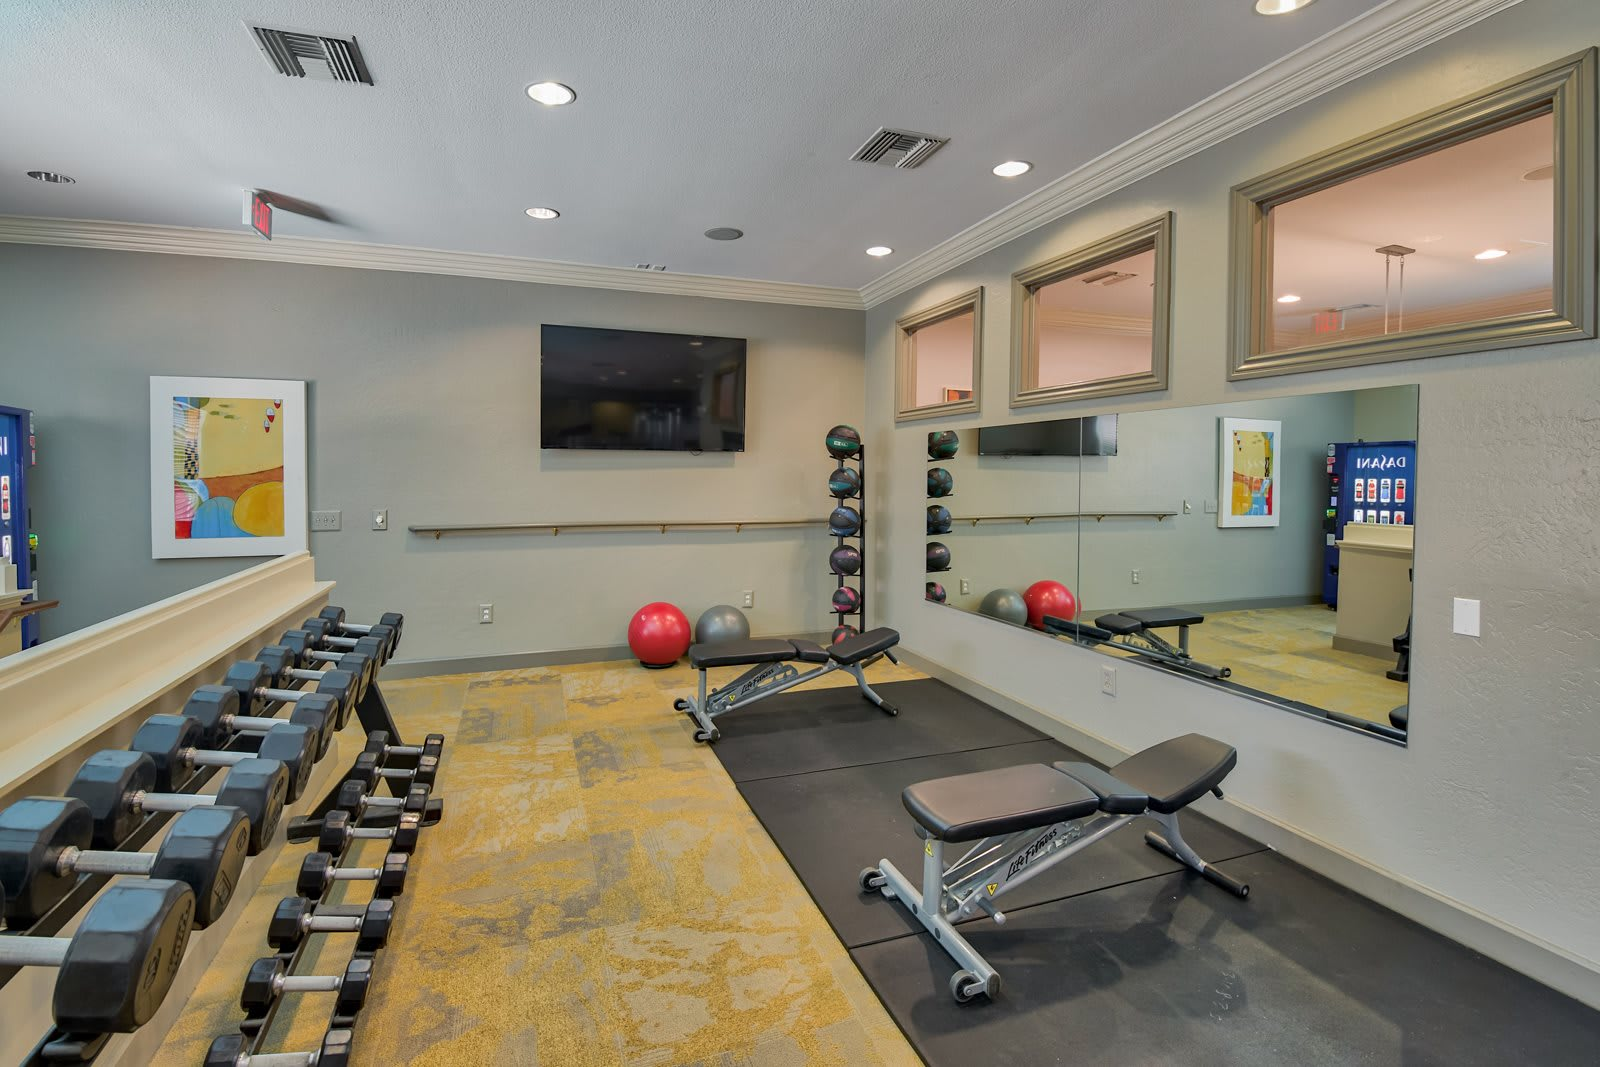 Free Weights, Medicine Balls and Stretching Space at Windsor at Aviara, 92011, California